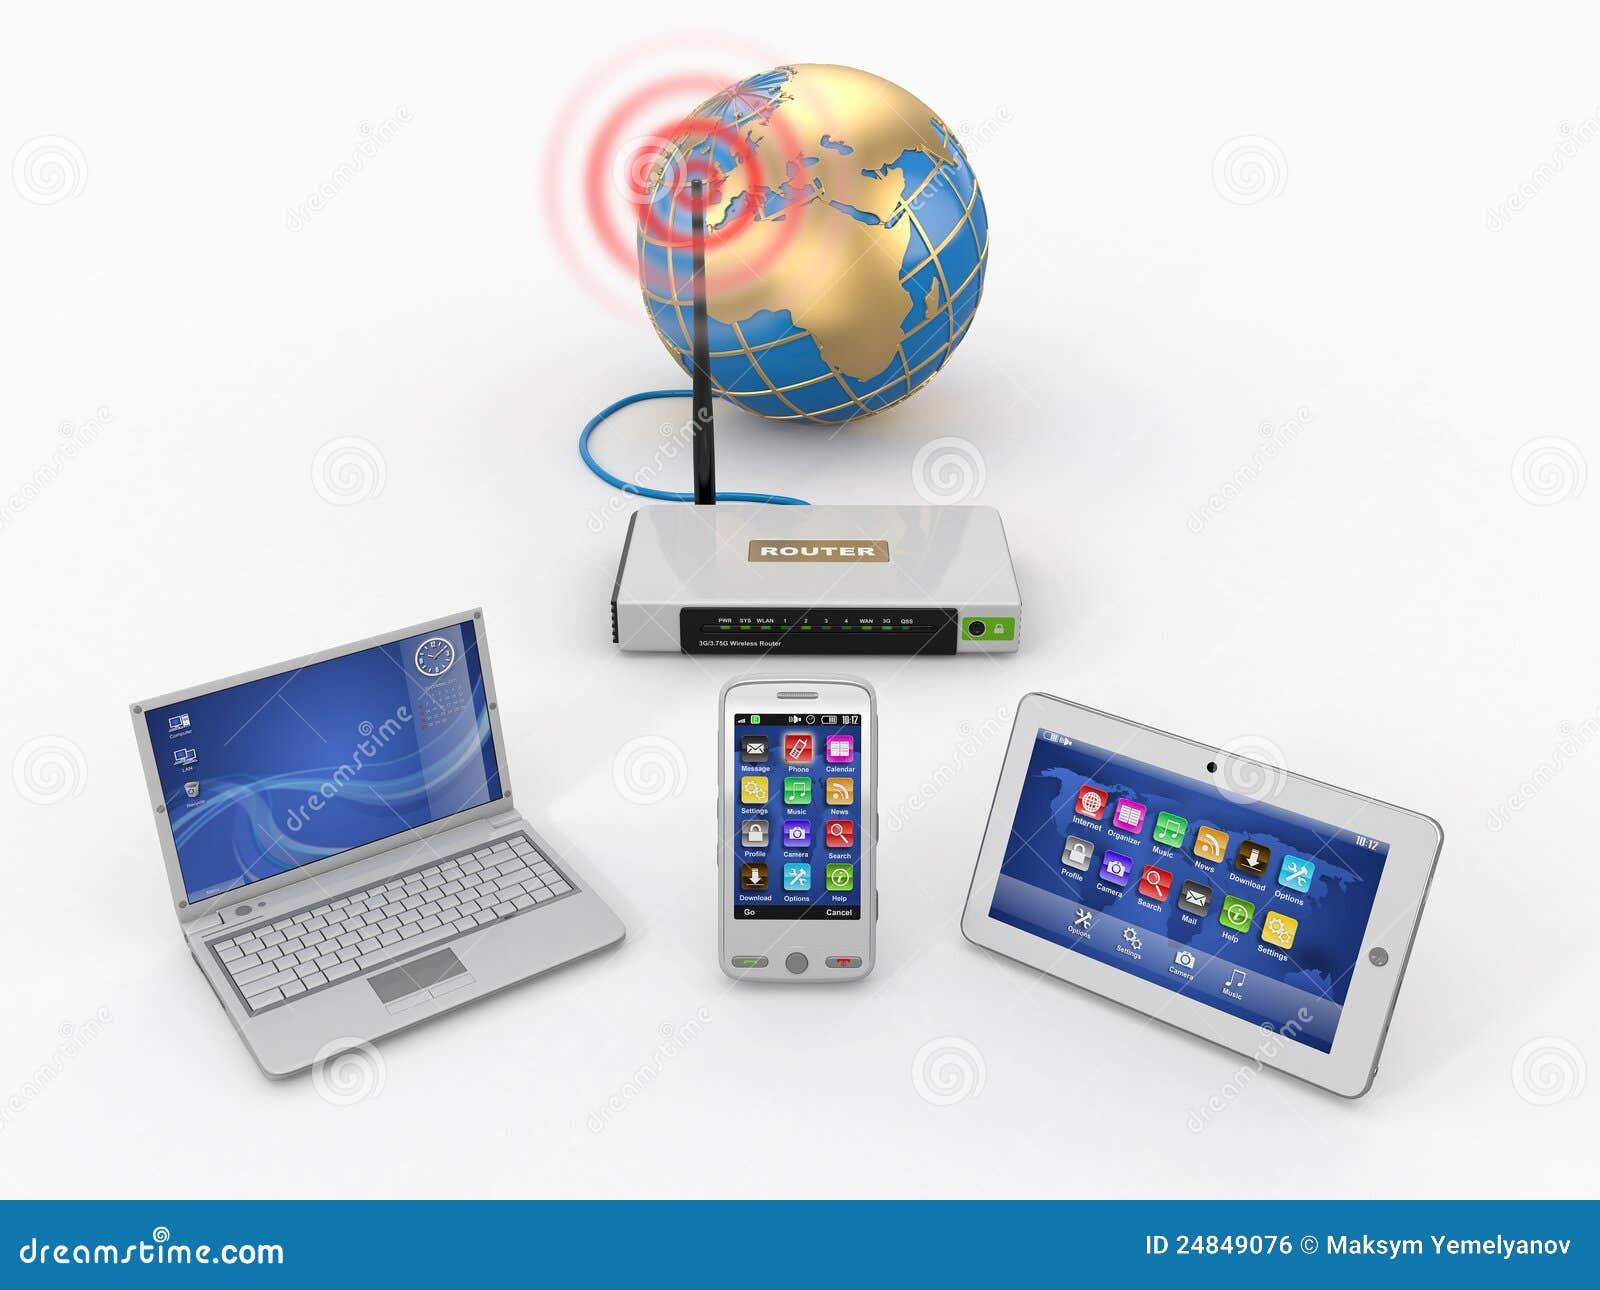 Free Wifi Network Design Software